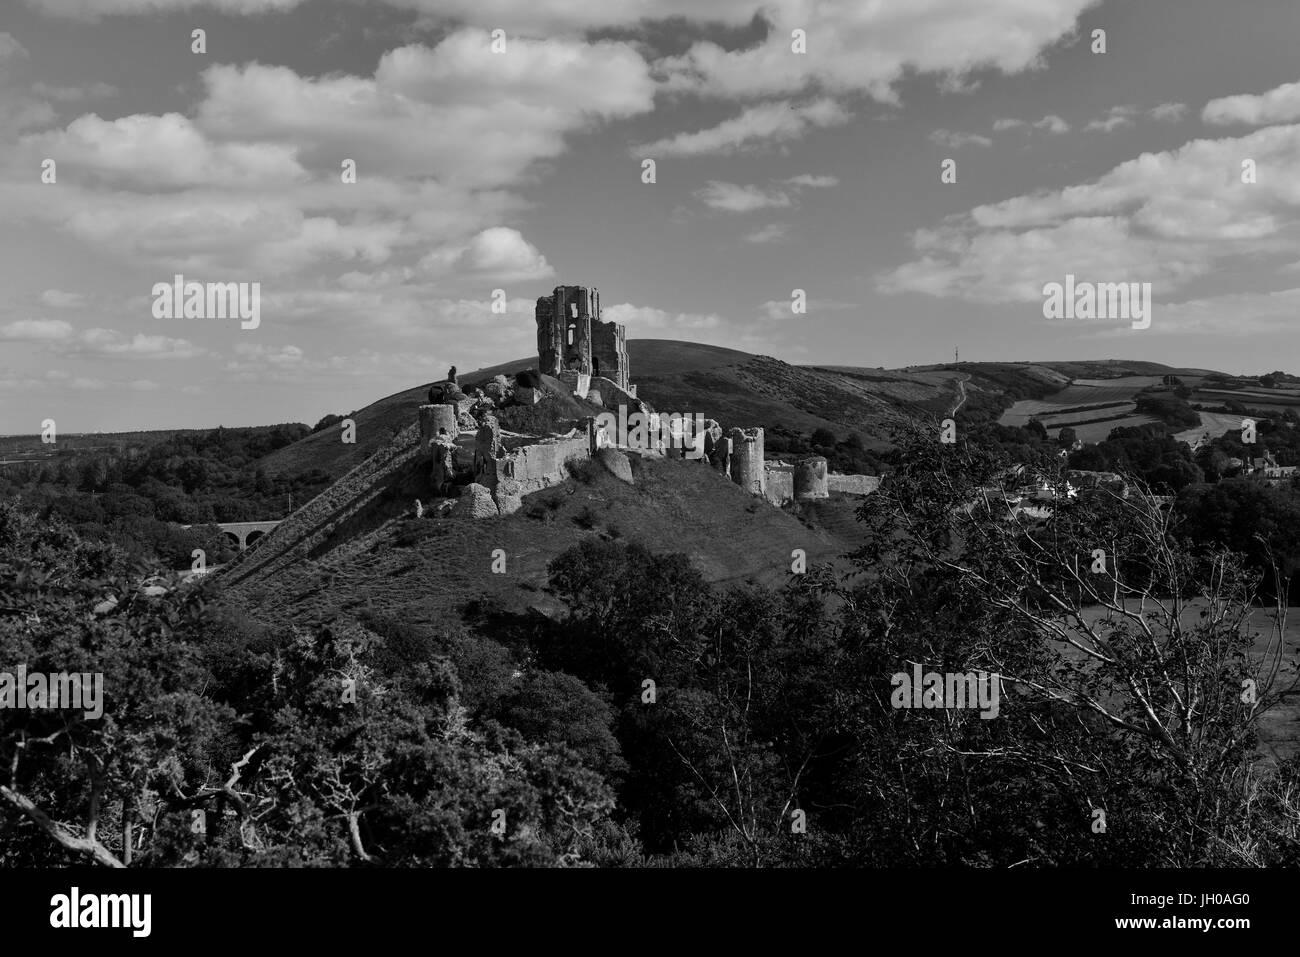 Corfe castle Dorset UK - Stock Image